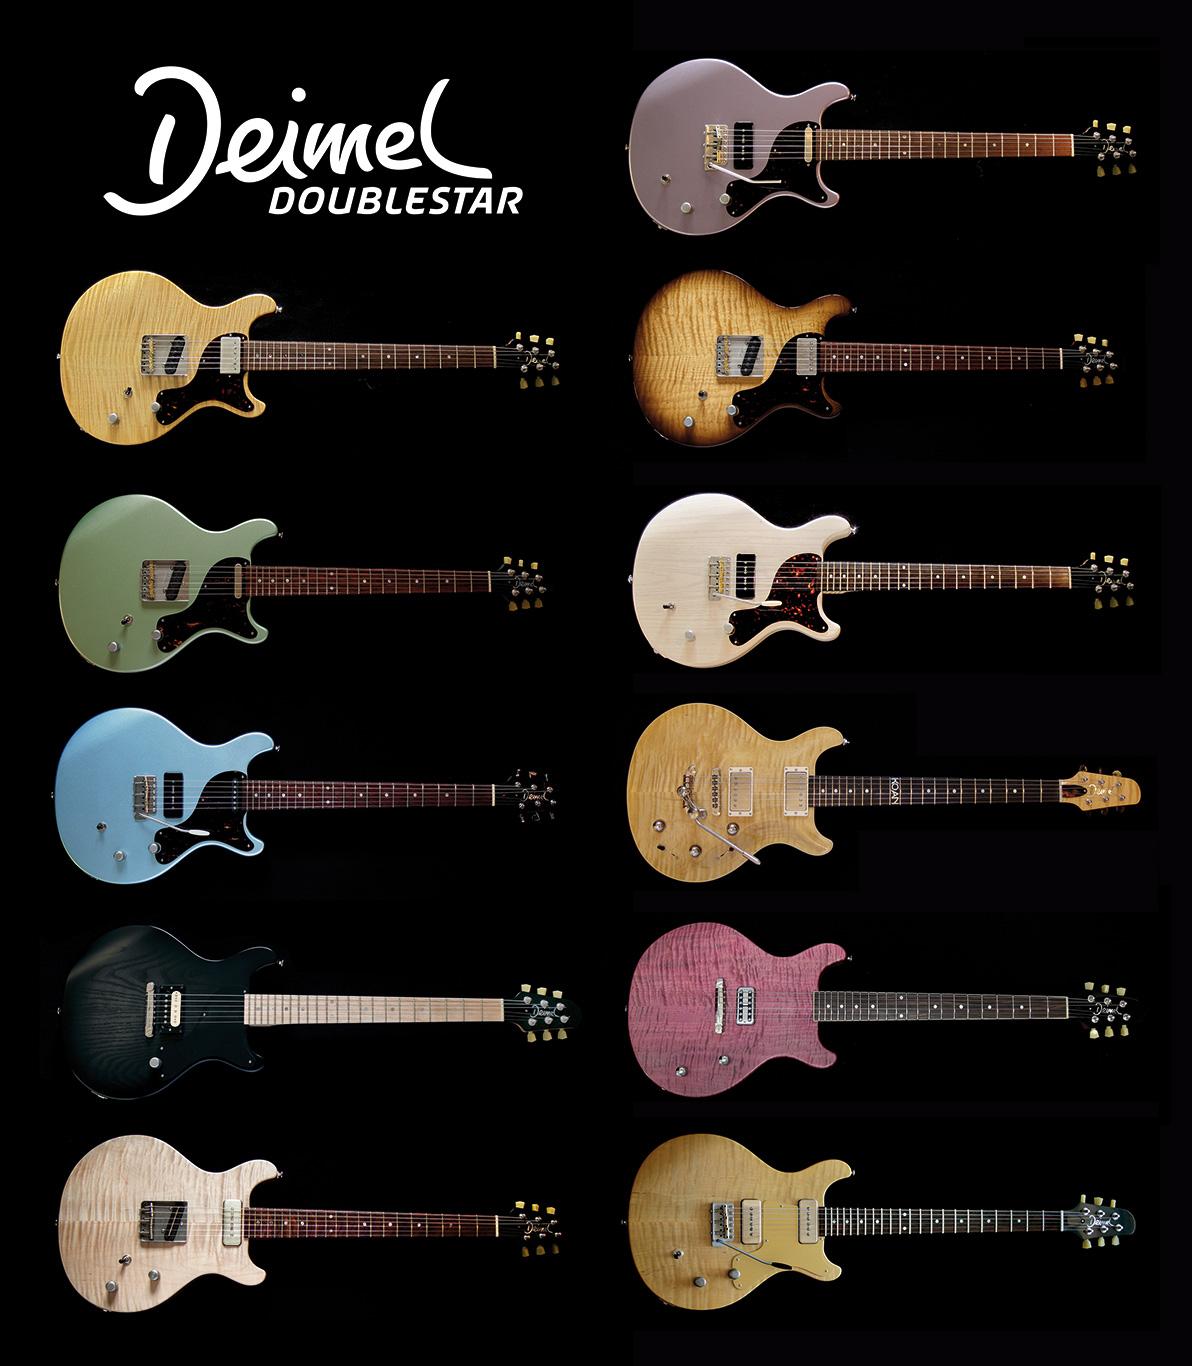 Deimel Doublestar Overview